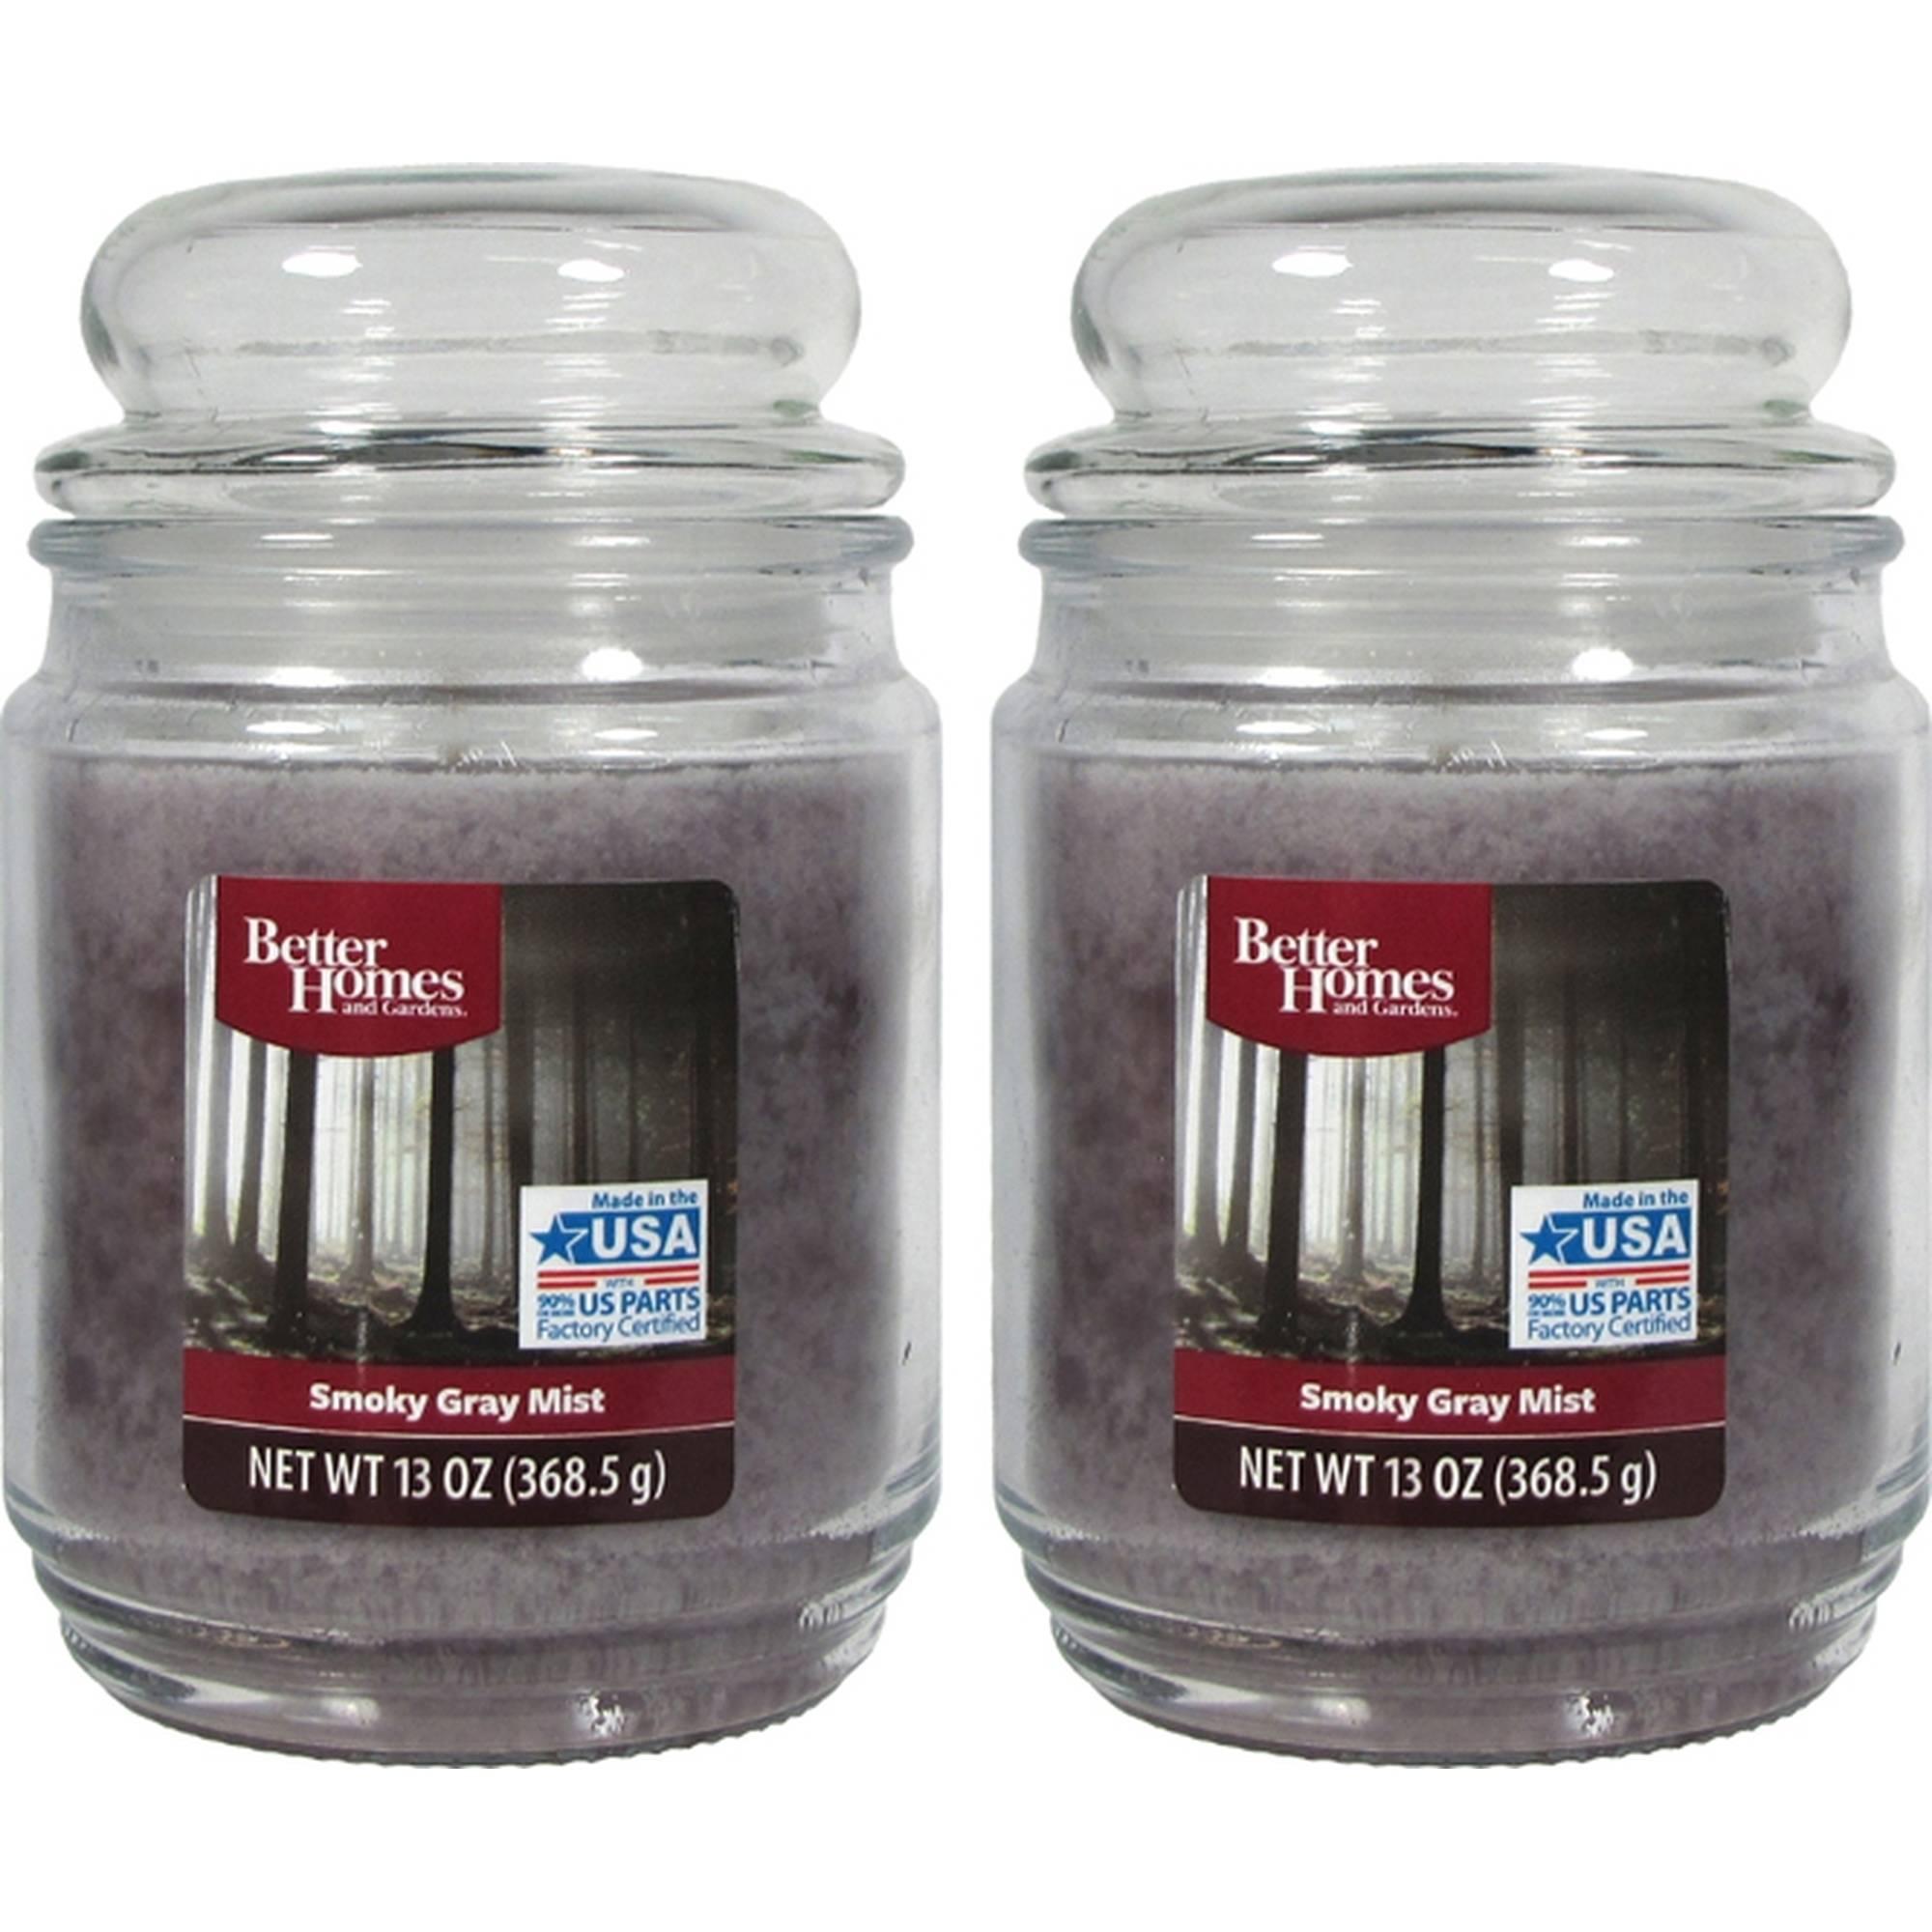 Better Homes & Gardens Jar Candle, Smoky Gray Mist, 13 oz